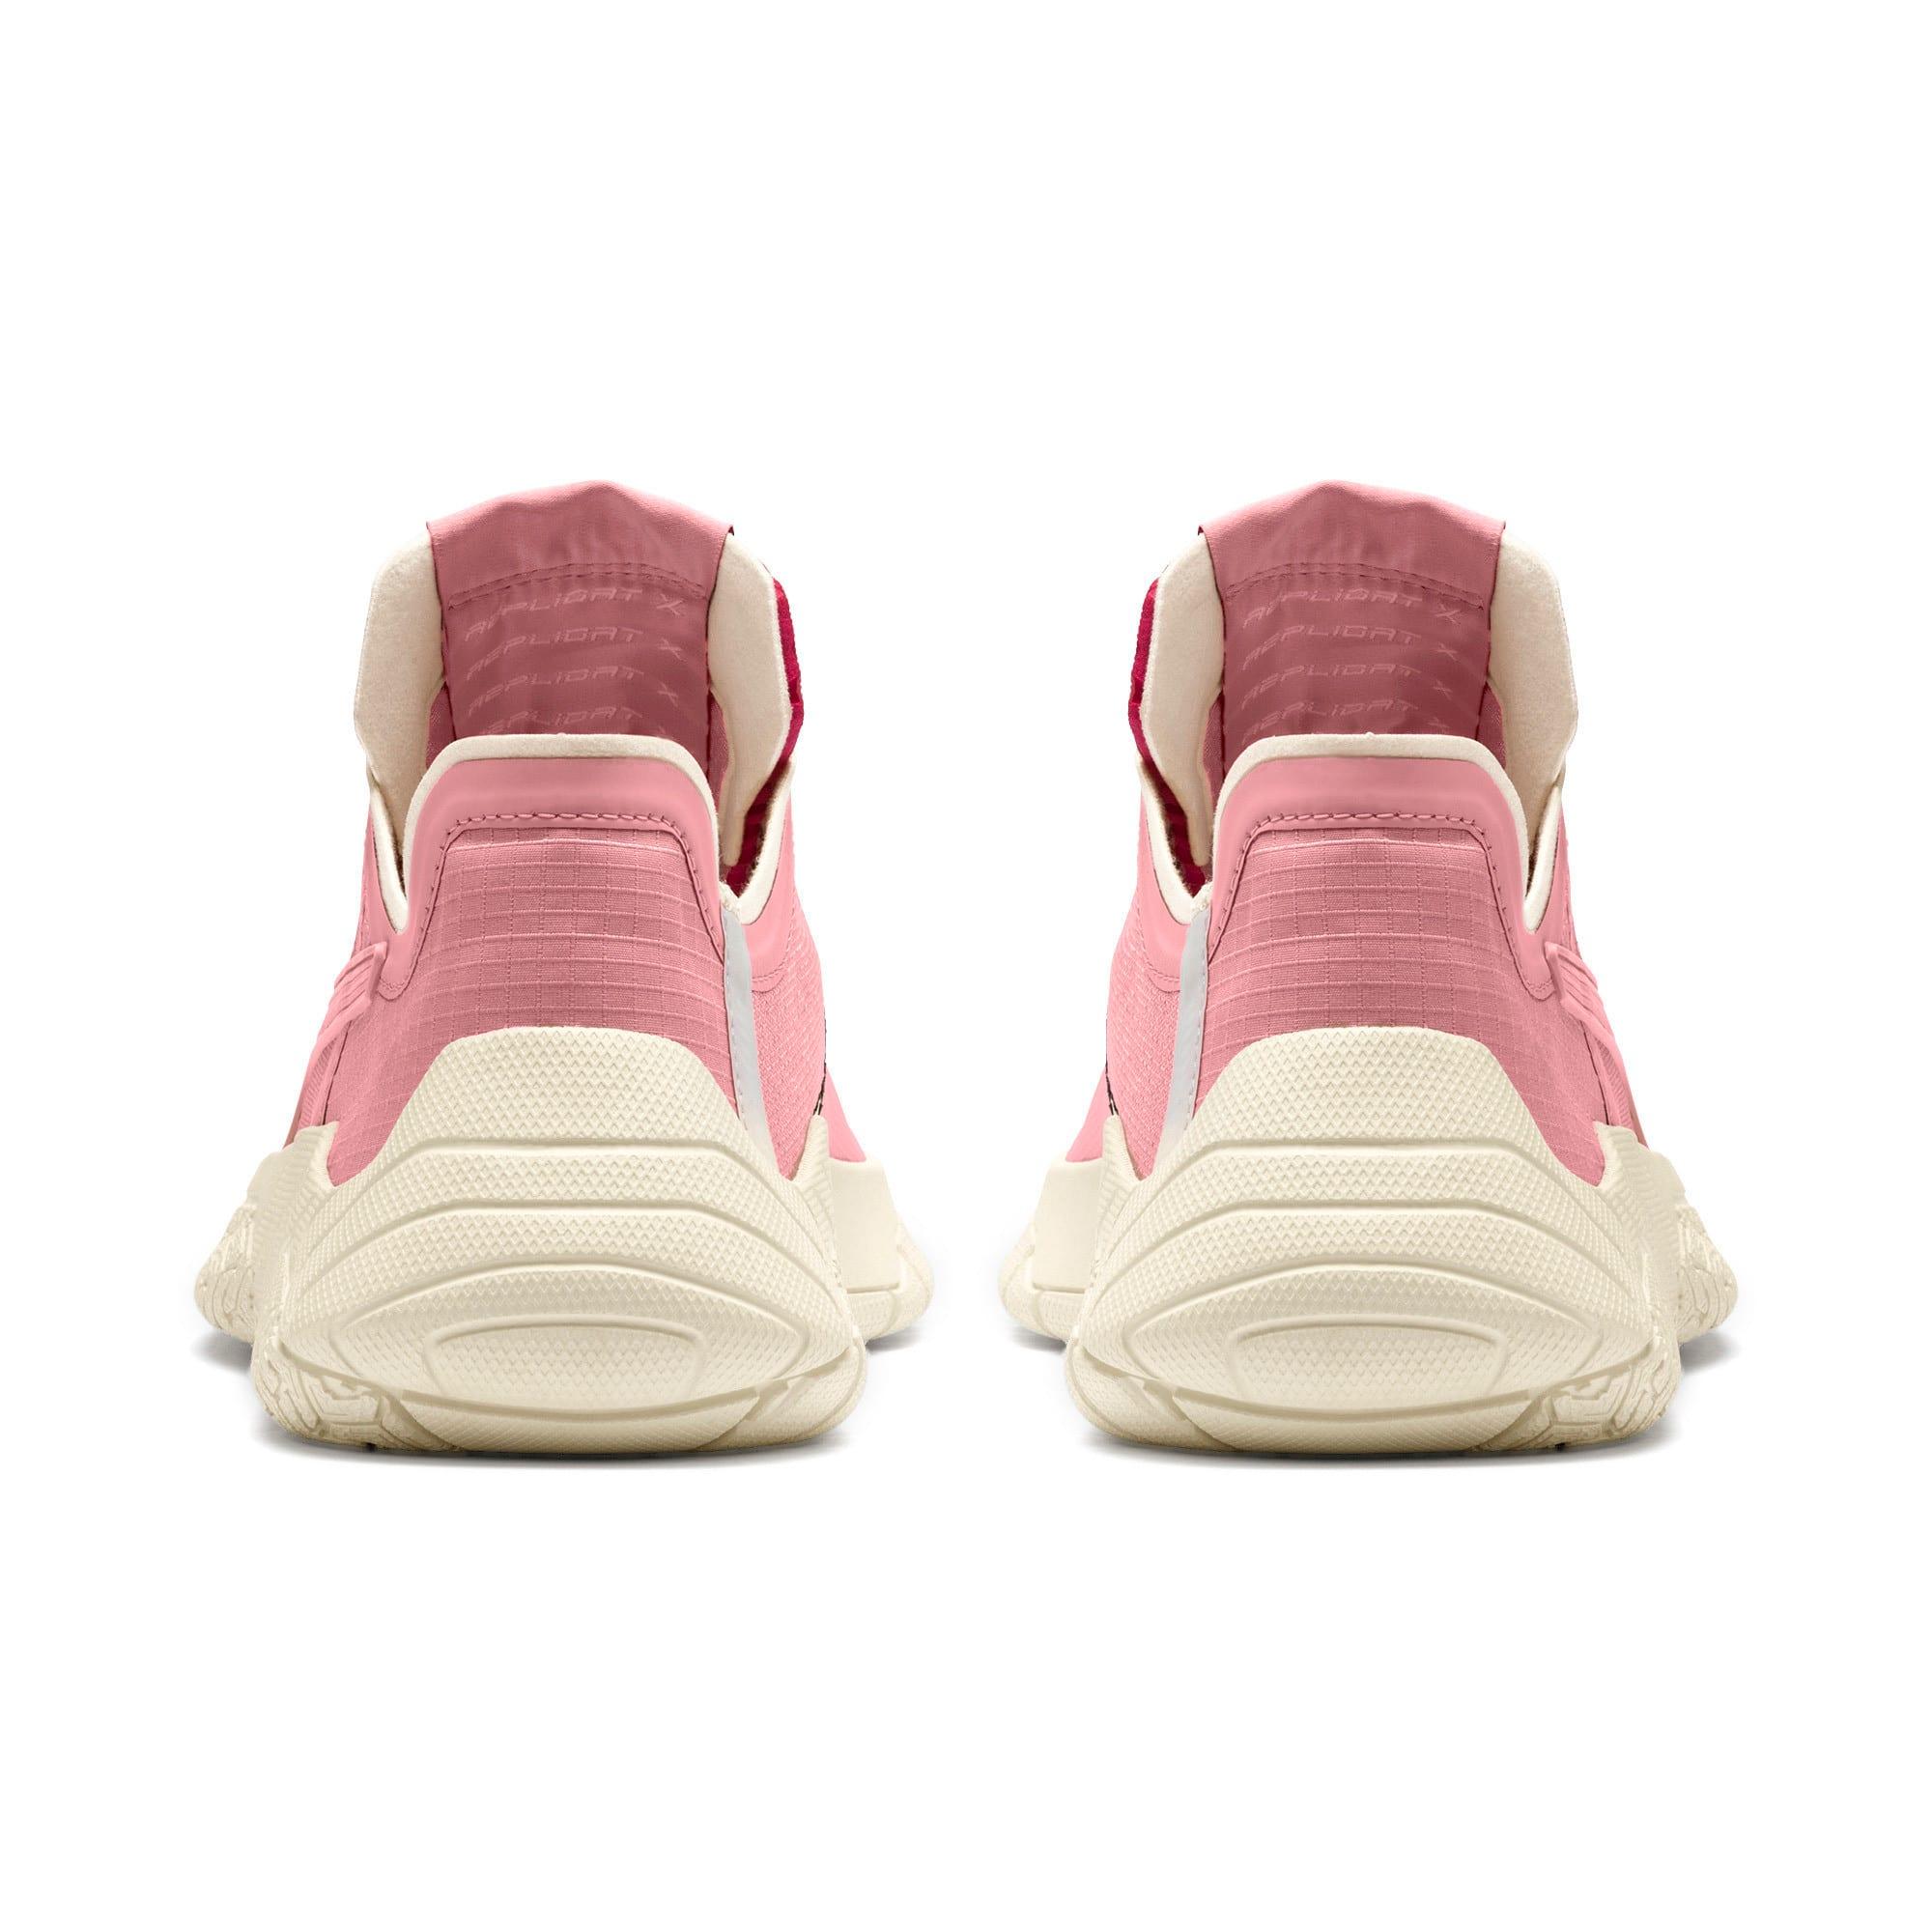 Thumbnail 3 of Replicat-X Circuit Motorsport Shoes, Bridal Rose-Whisper White, medium